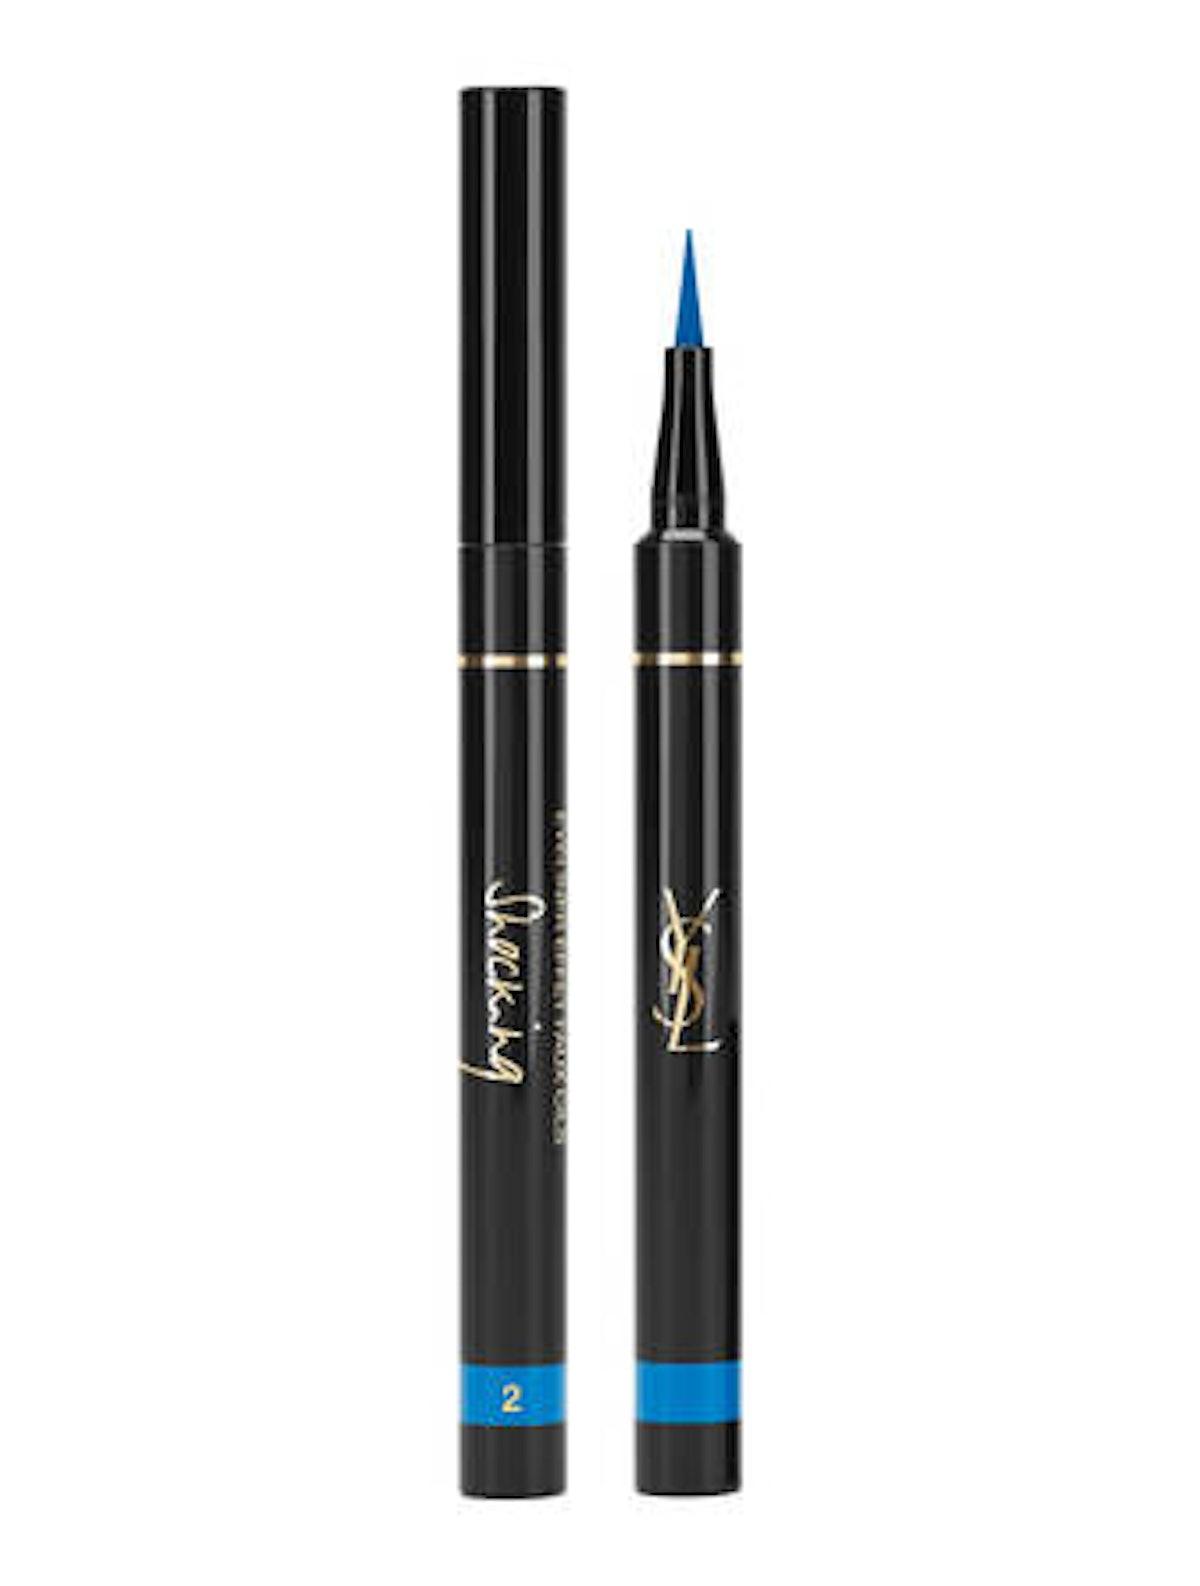 Yves Saint Laurent Eyeliner Effect Faux Cils Shocking in Majorelle Blue